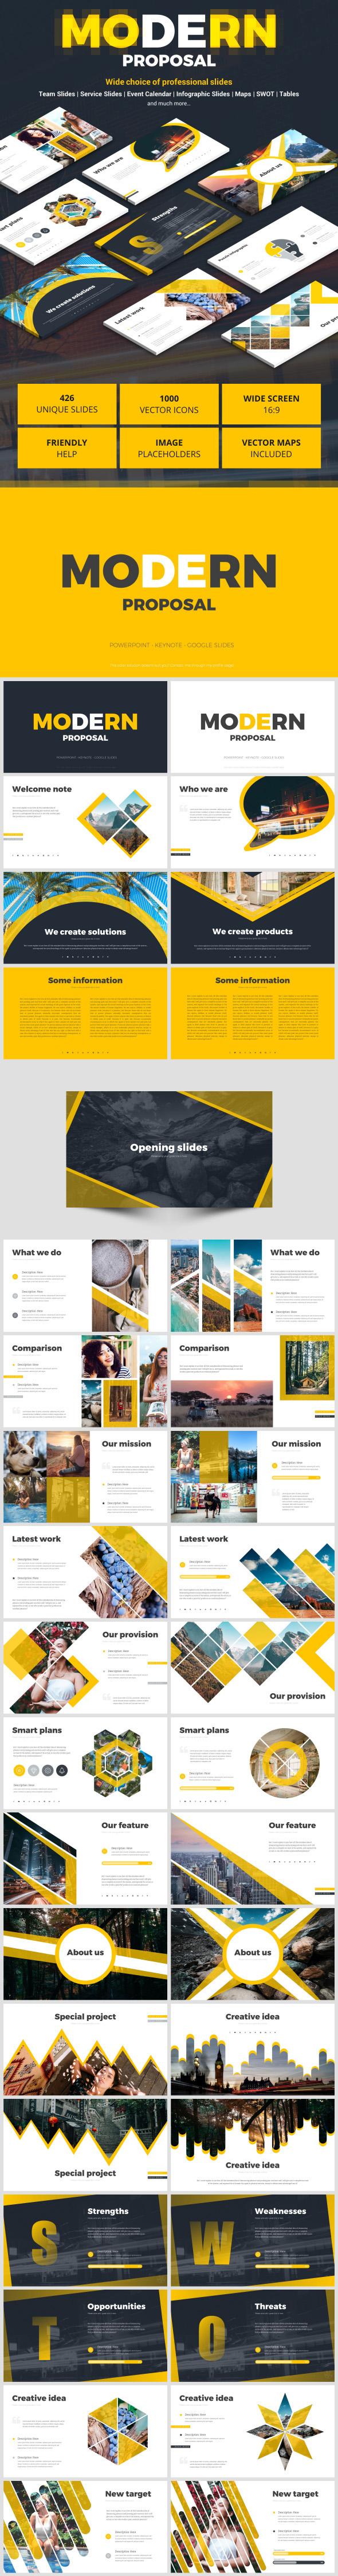 Modern Proposal - Google Slides Presentation Templates